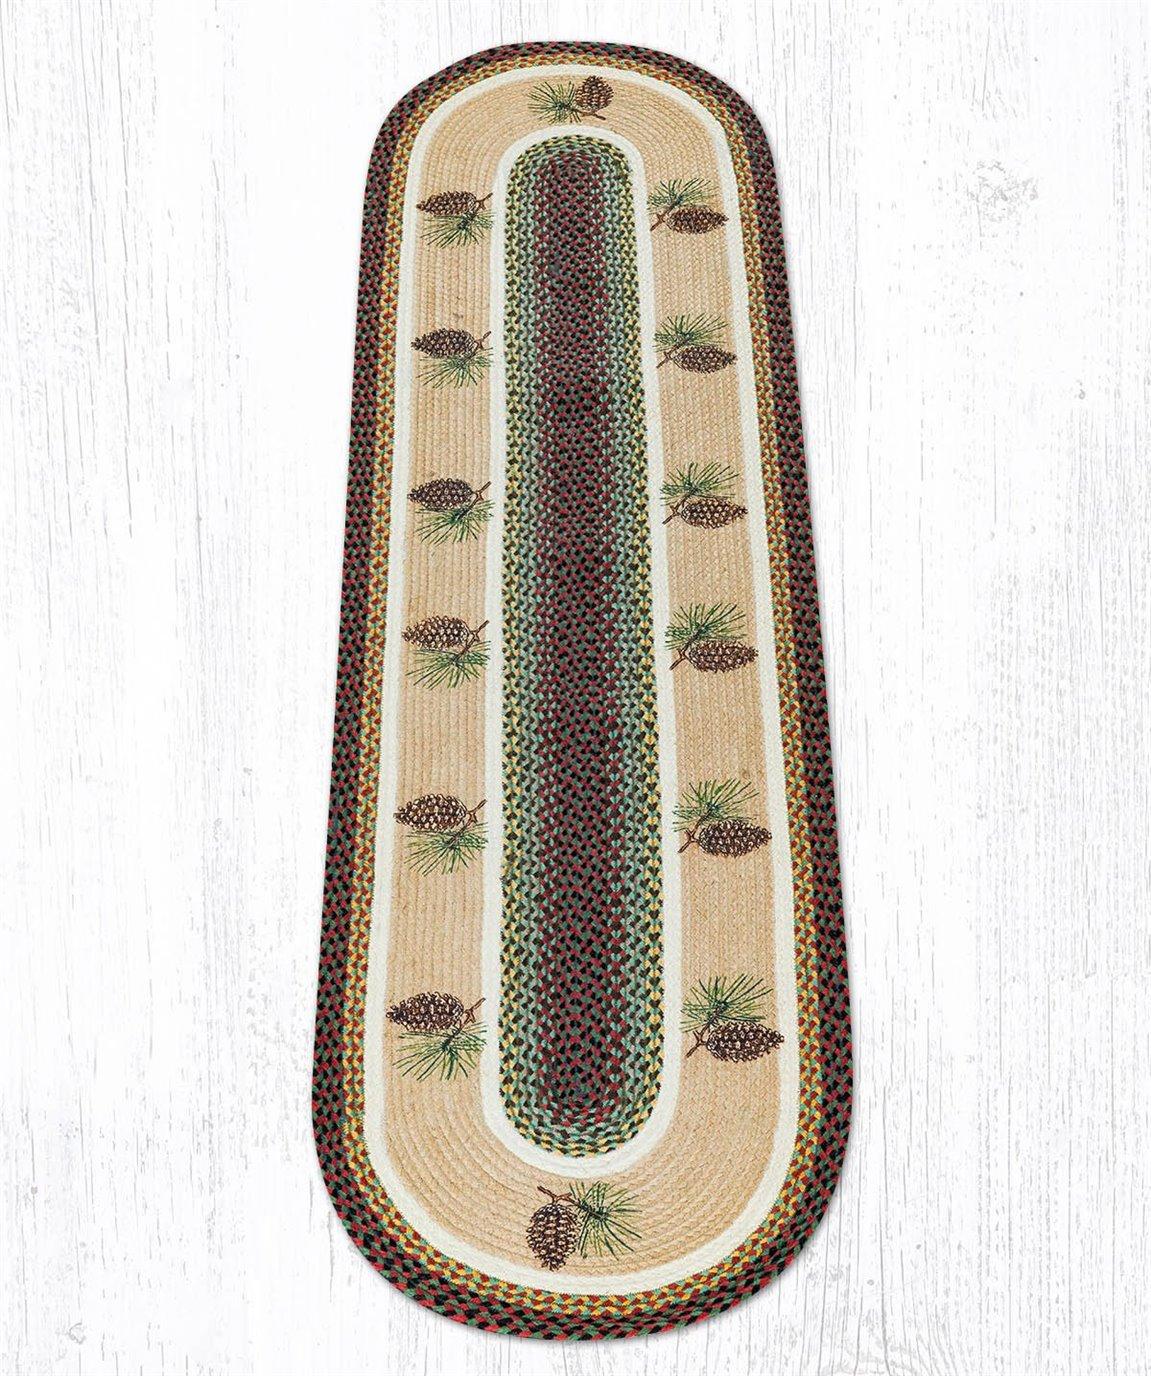 Pinecone Oval Braided Rug 2'x8'